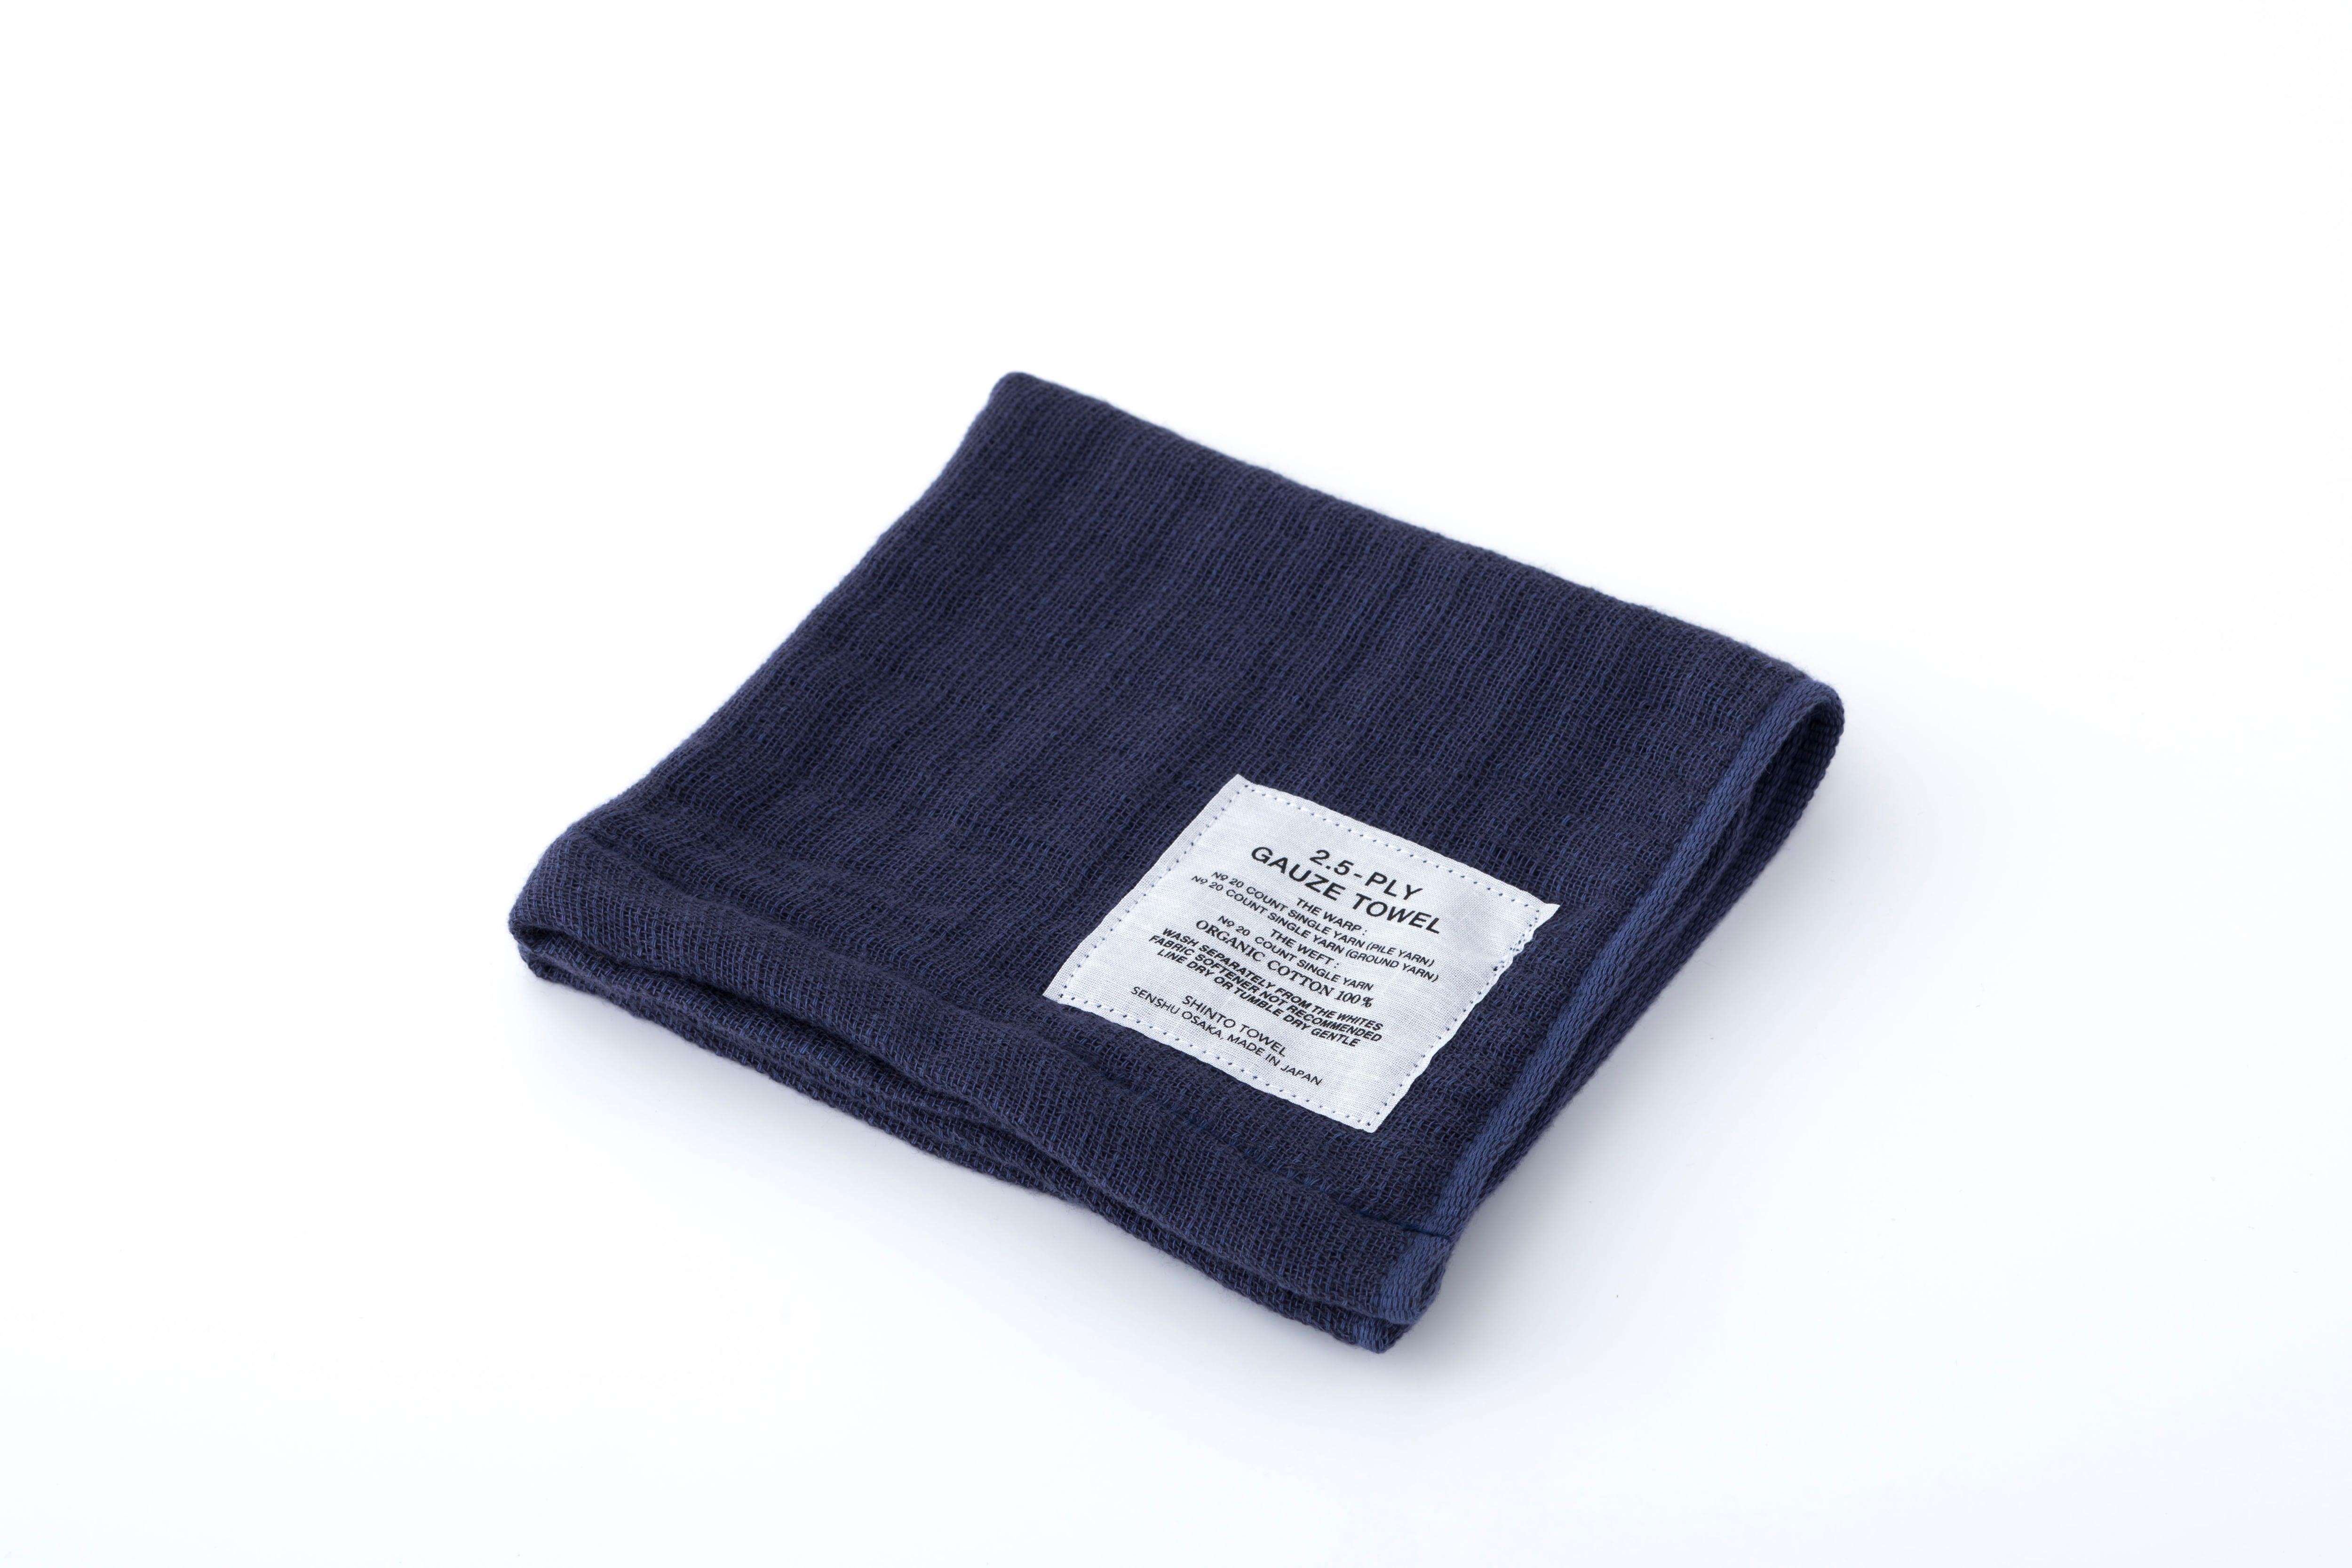 2.5-PLY GAUZE TOWEL:HANDY TOWEL (Navy) / SHINTO TOWEL